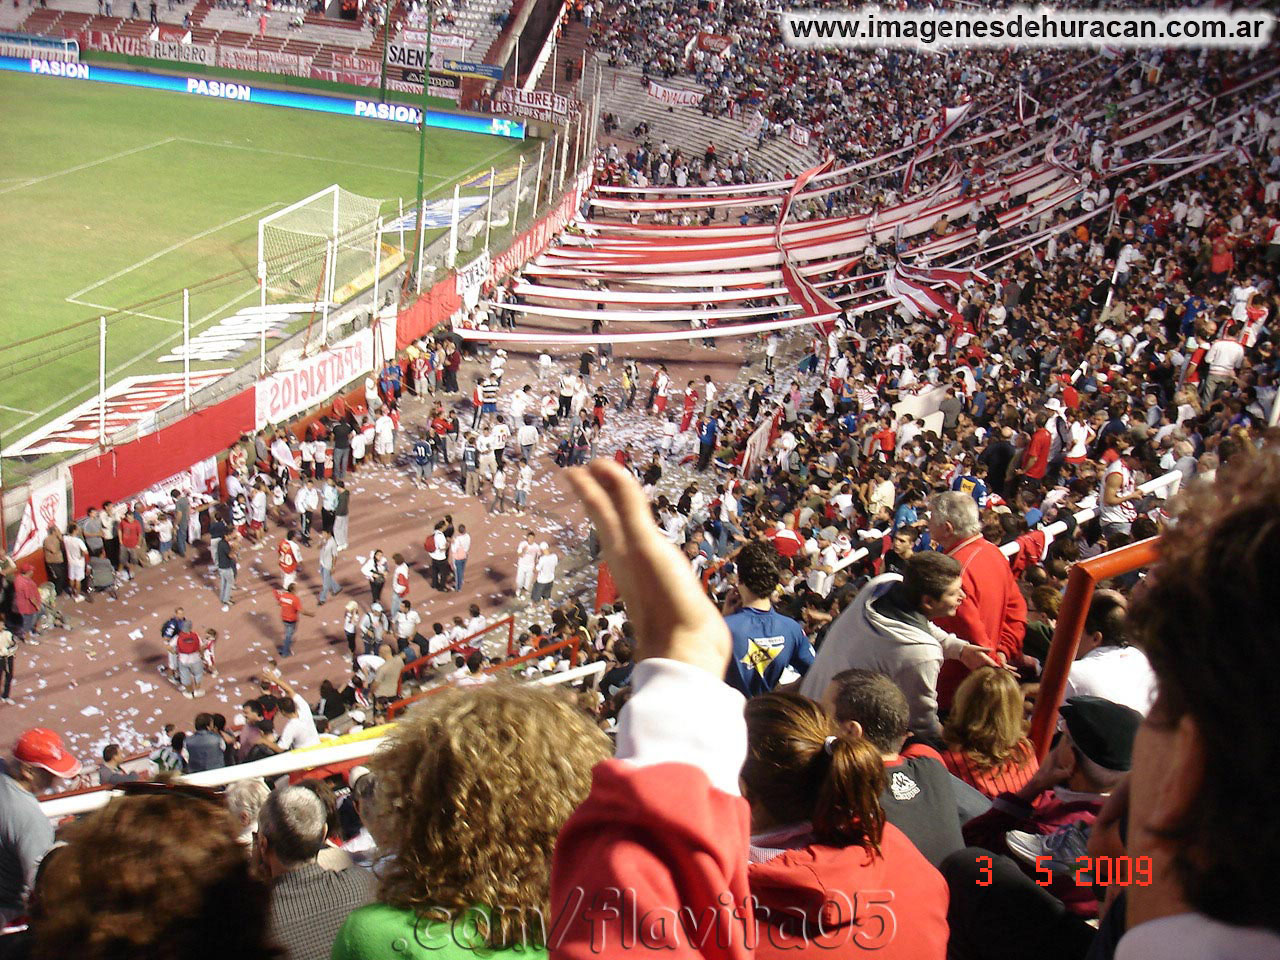 Huracán vs godoy cruz fecha 12 clausura 2009